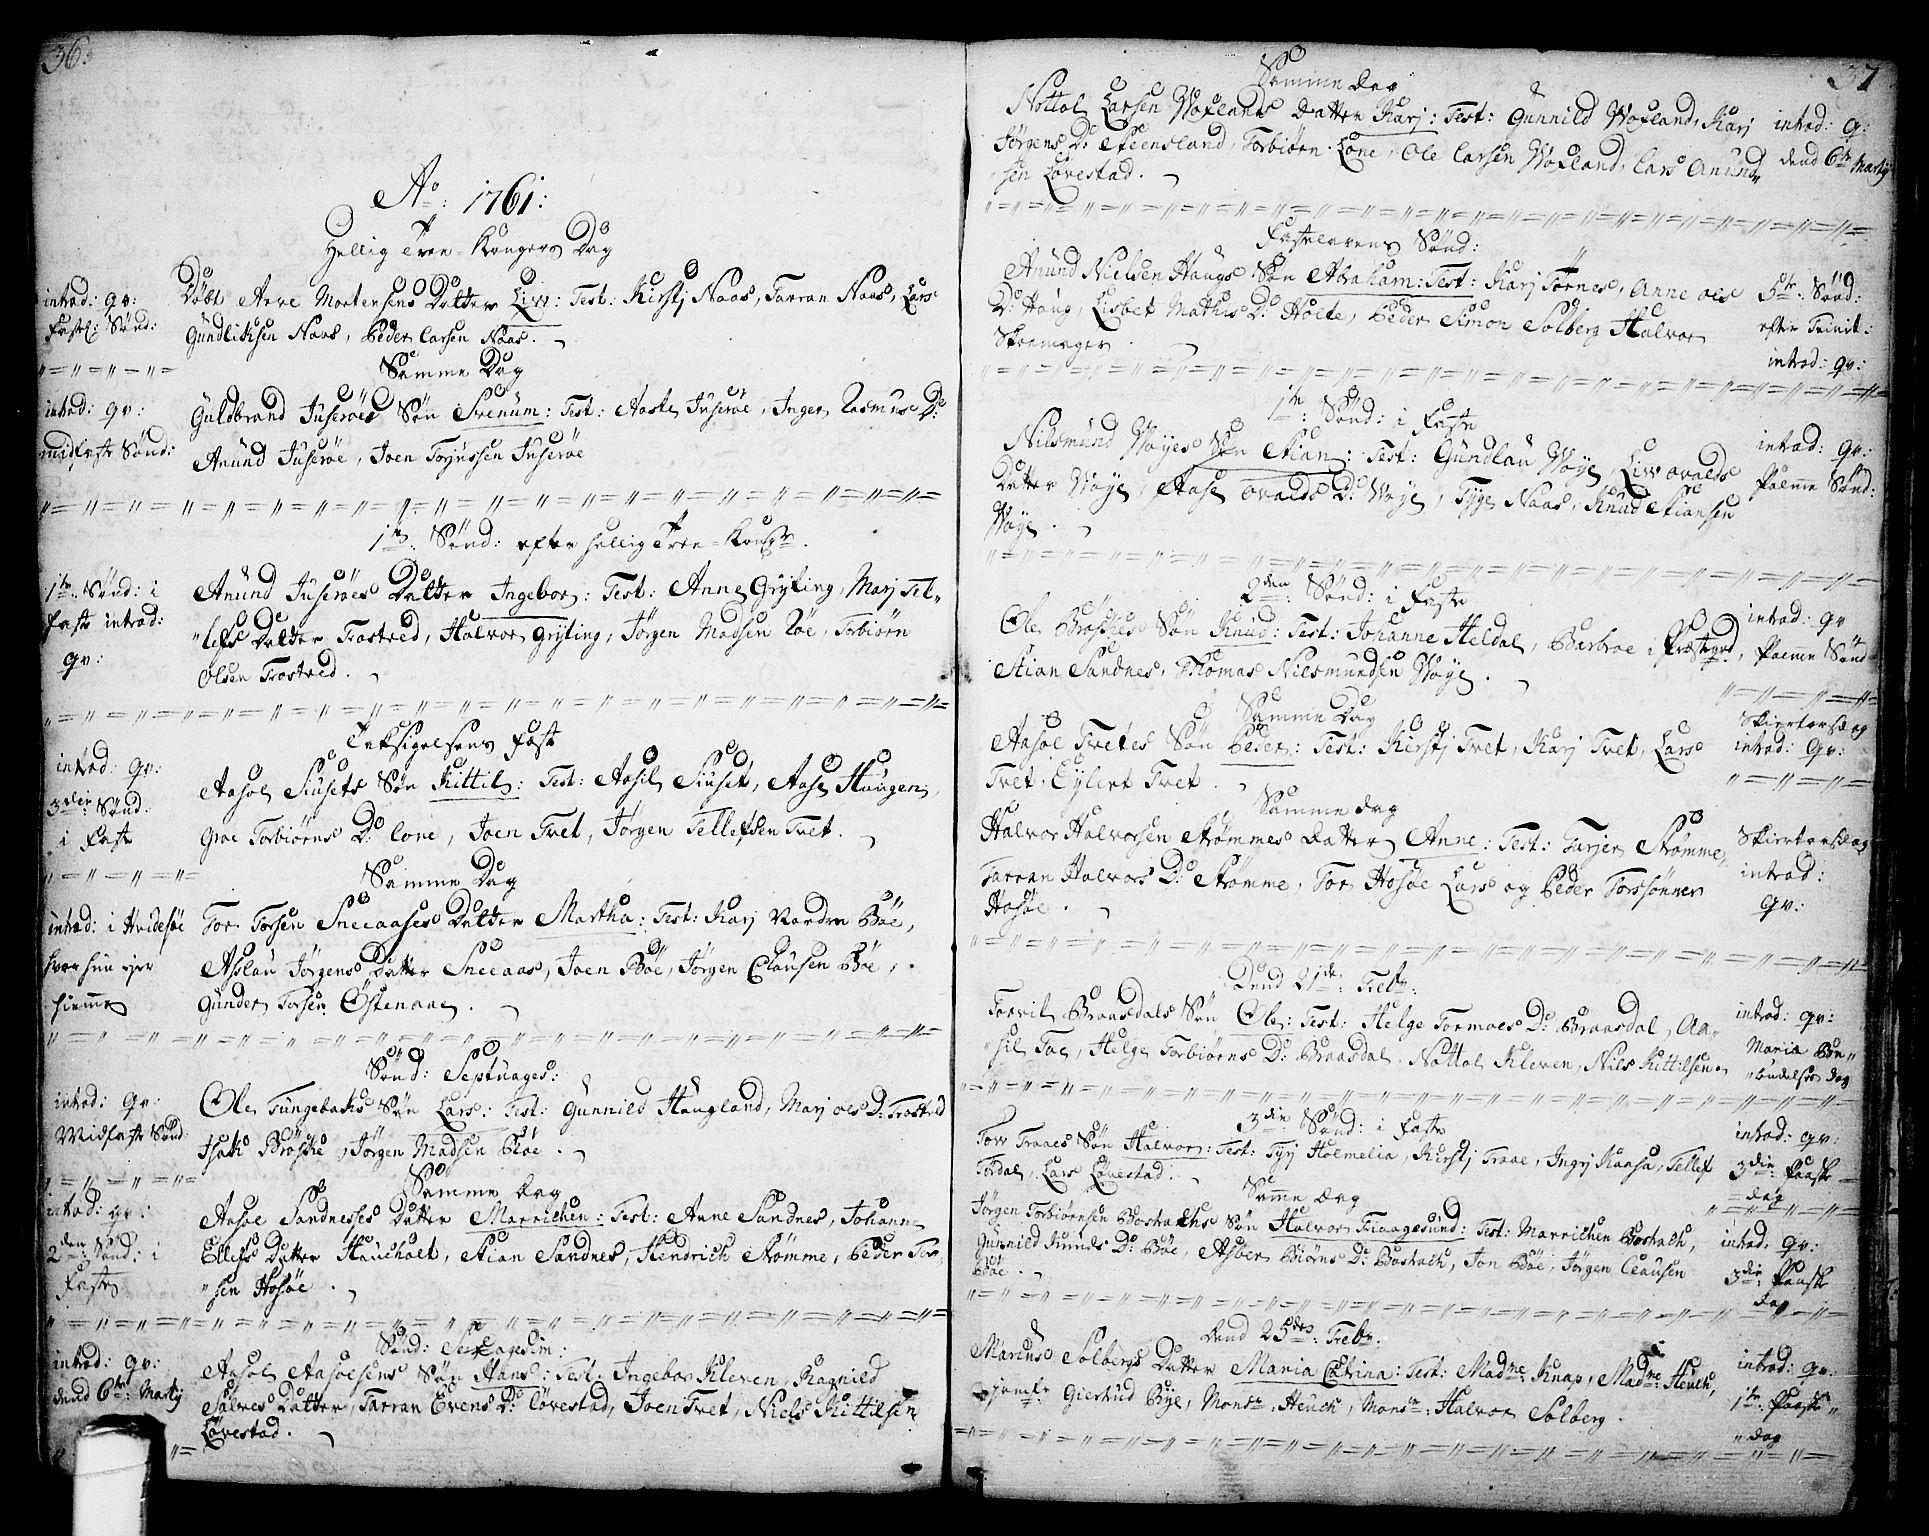 SAKO, Drangedal kirkebøker, F/Fa/L0001: Ministerialbok nr. 1, 1697-1767, s. 36-37